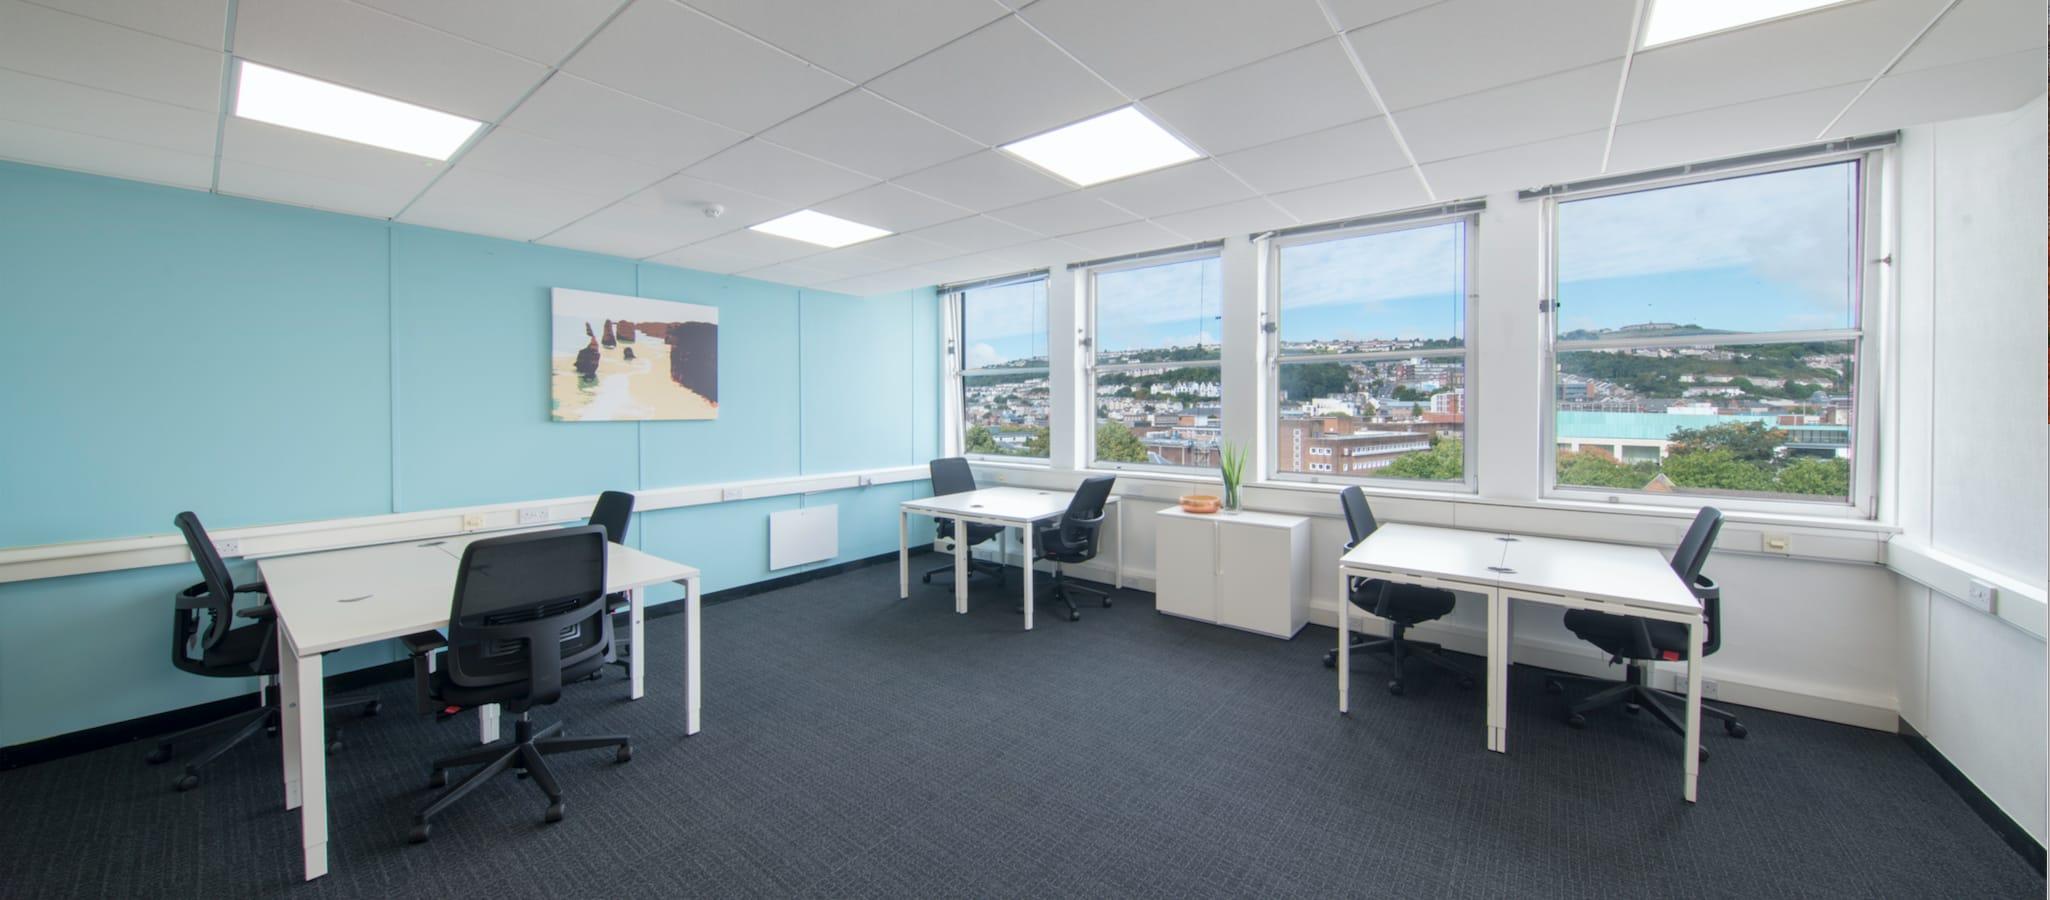 HQ Swansea wins Coworker Members' Choice Award 2019